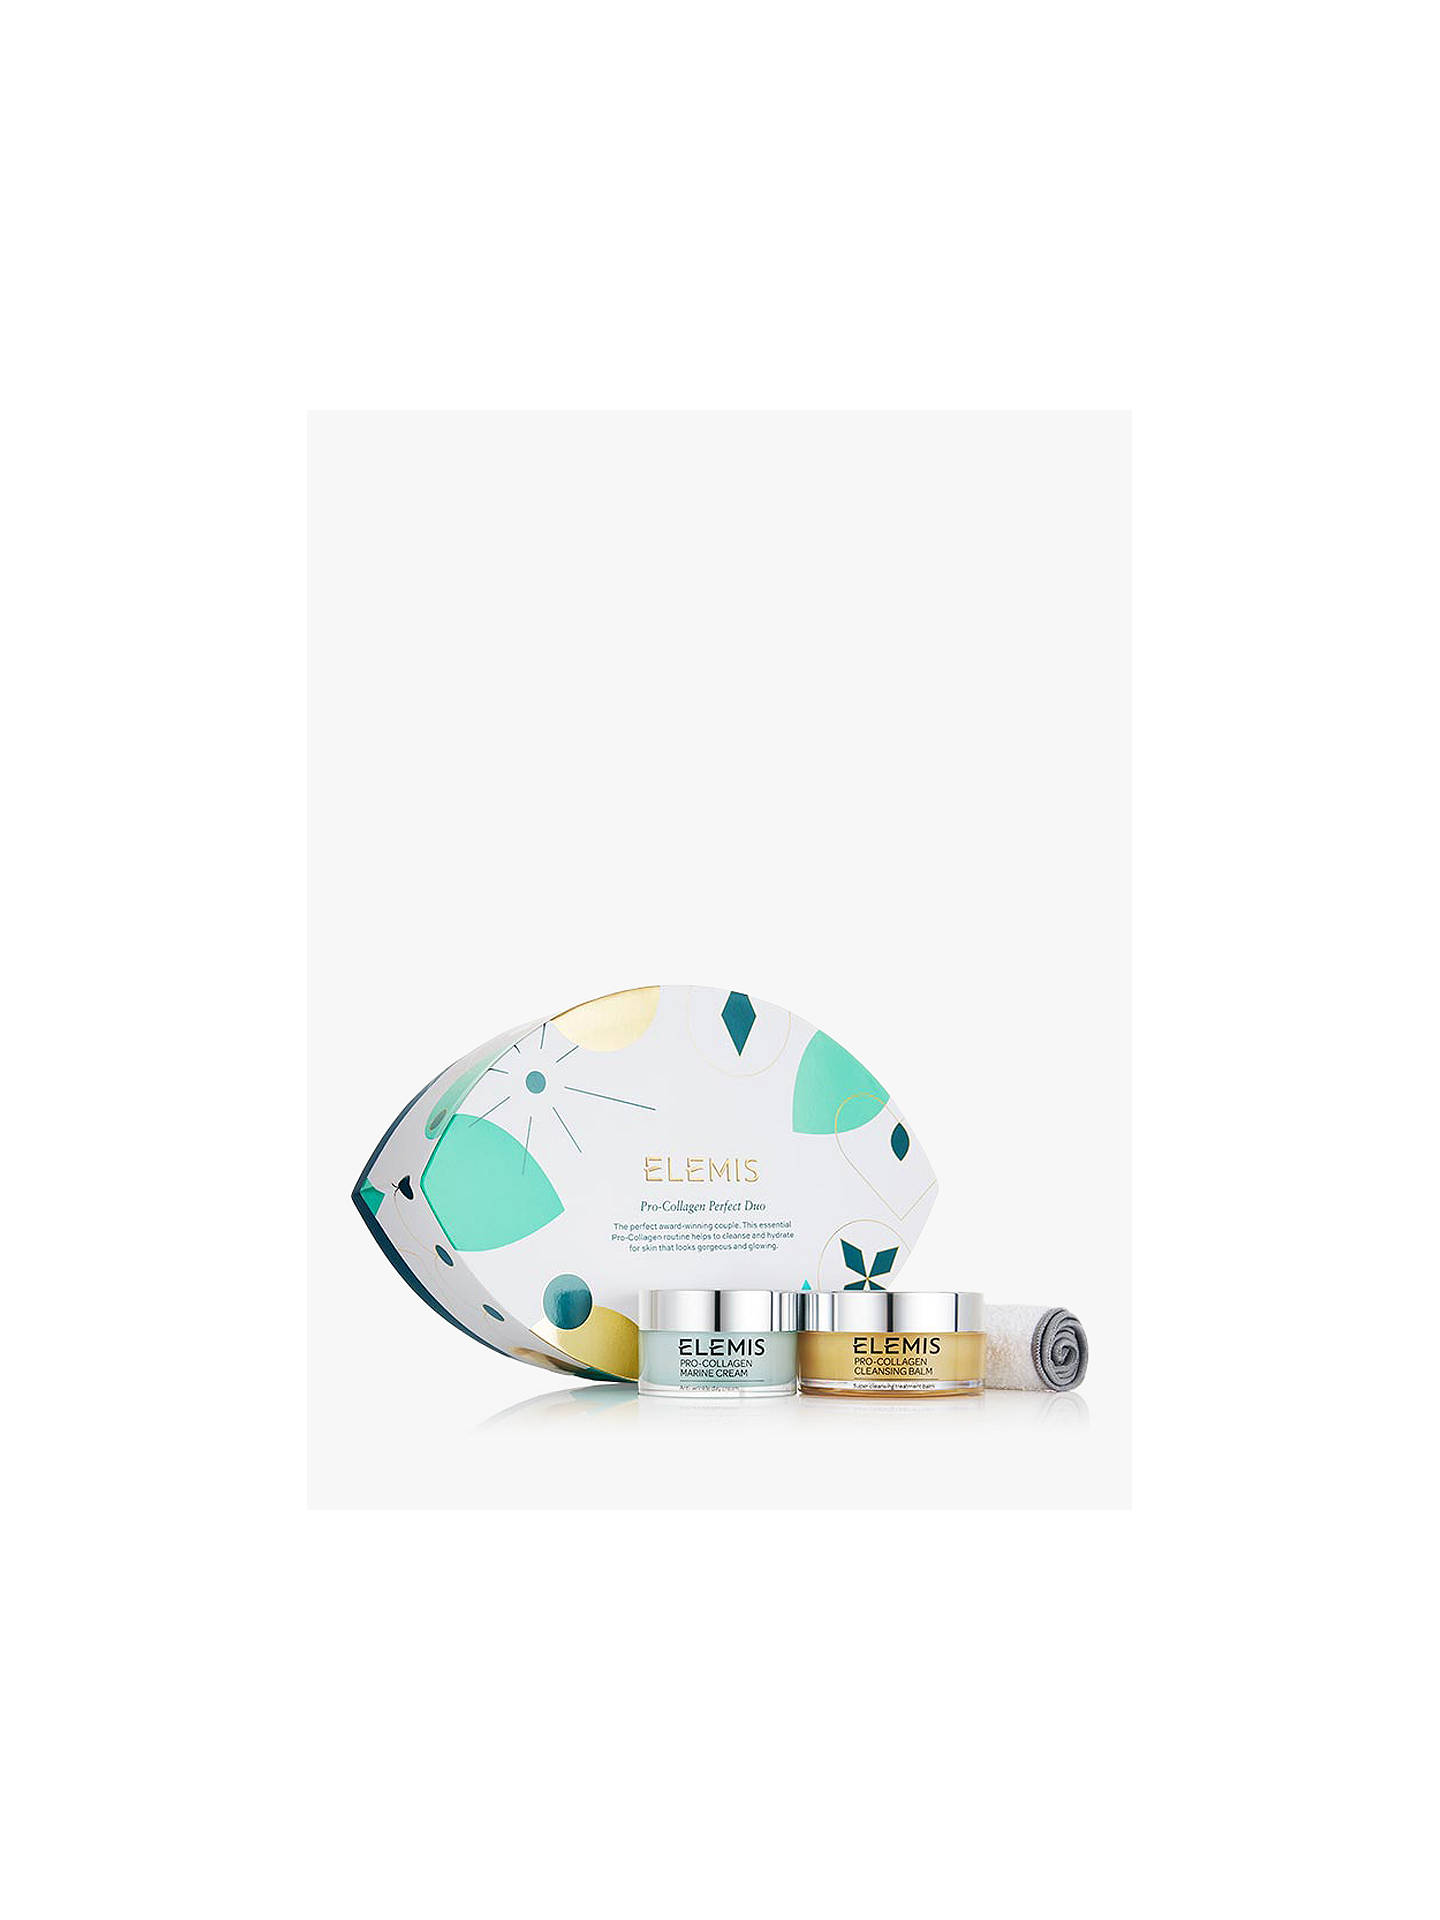 Elemis Pro Collagen Perfect Duo Skincare Gift Set by Elemis